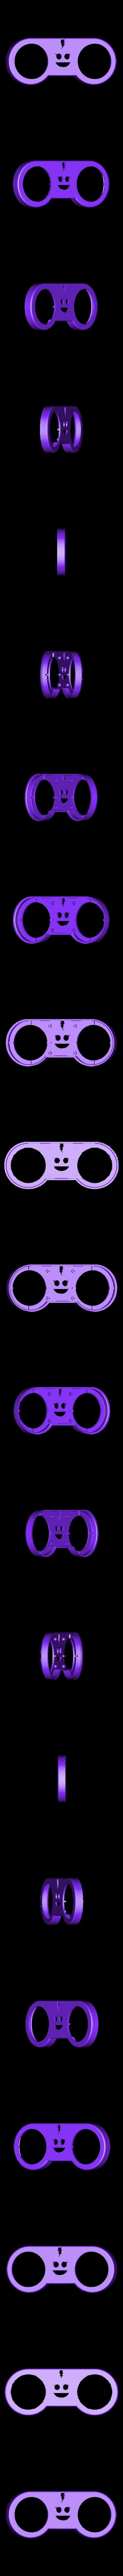 joy-top-face.stl Download free STL file Joy The Gamepad Controller • 3D printable object, Adafruit